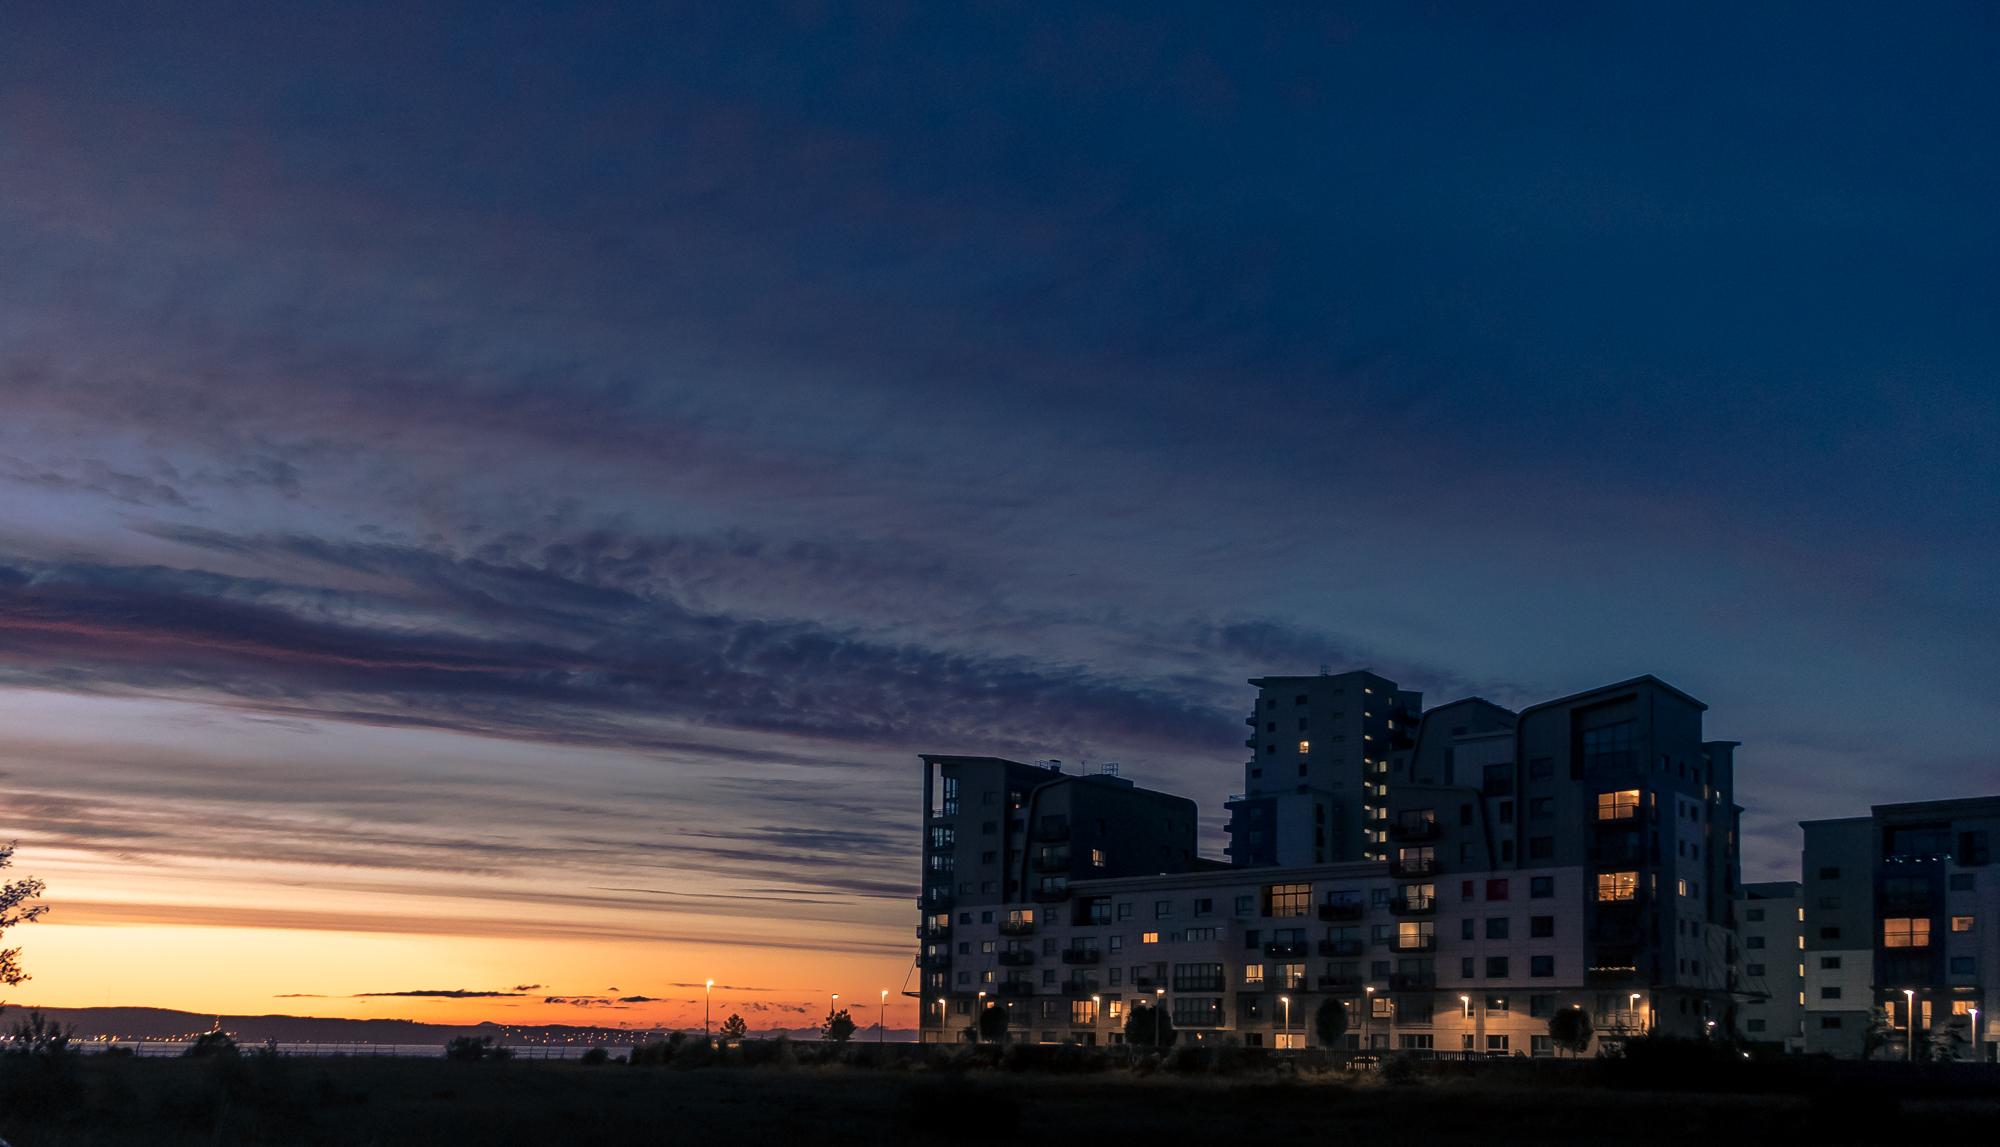 SunsetWstrnHrbr_web-003.jpg